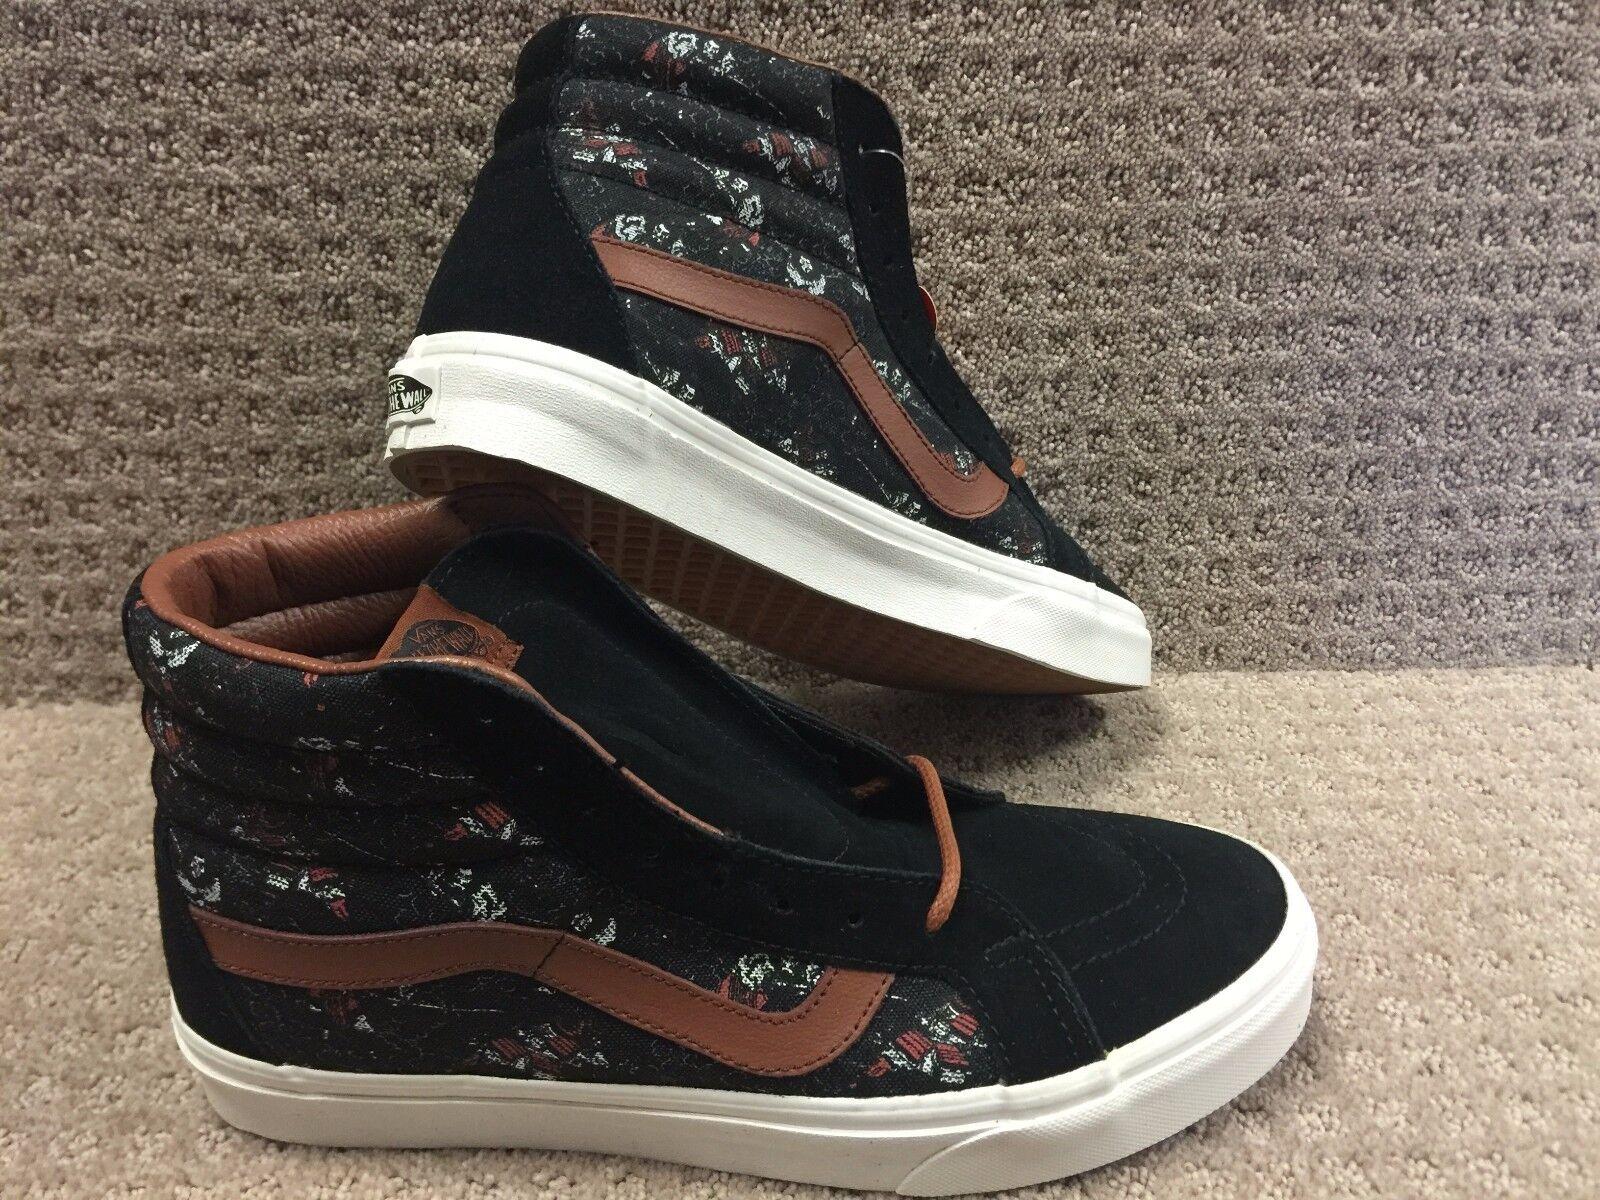 Vans Men's shoes  Sk8-Hi Reissue  (Samurai Warrior) Black